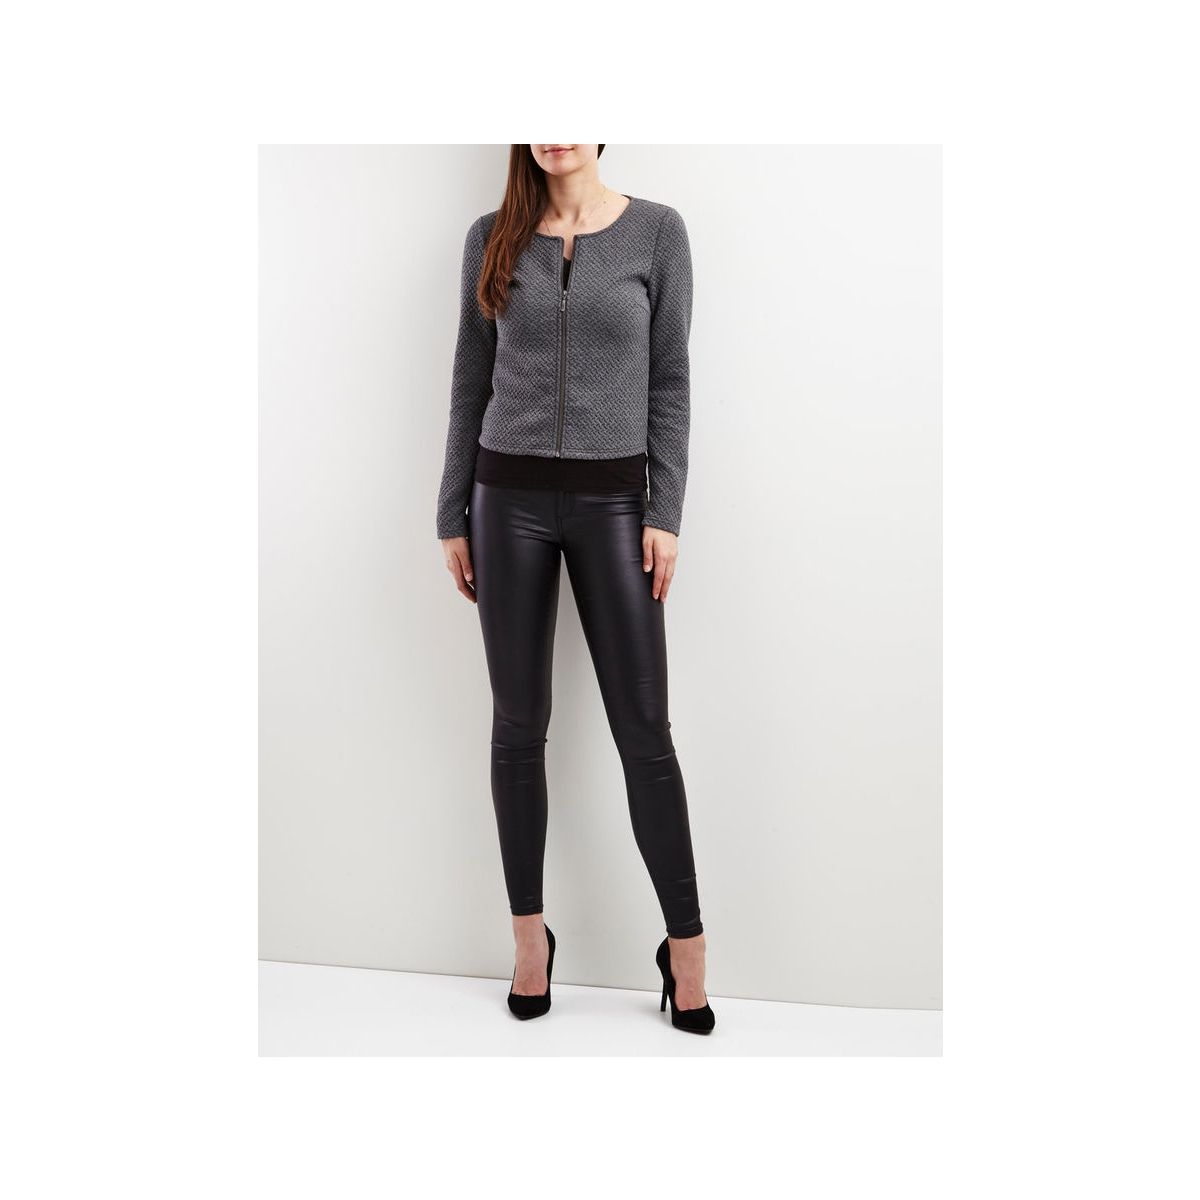 vinaja new short jacket 14032657 vila vest medium grey melange